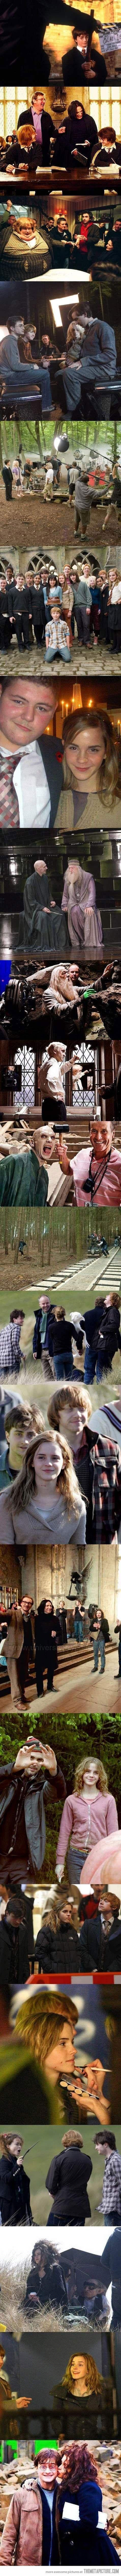 Harry Potter behind the scenes <3